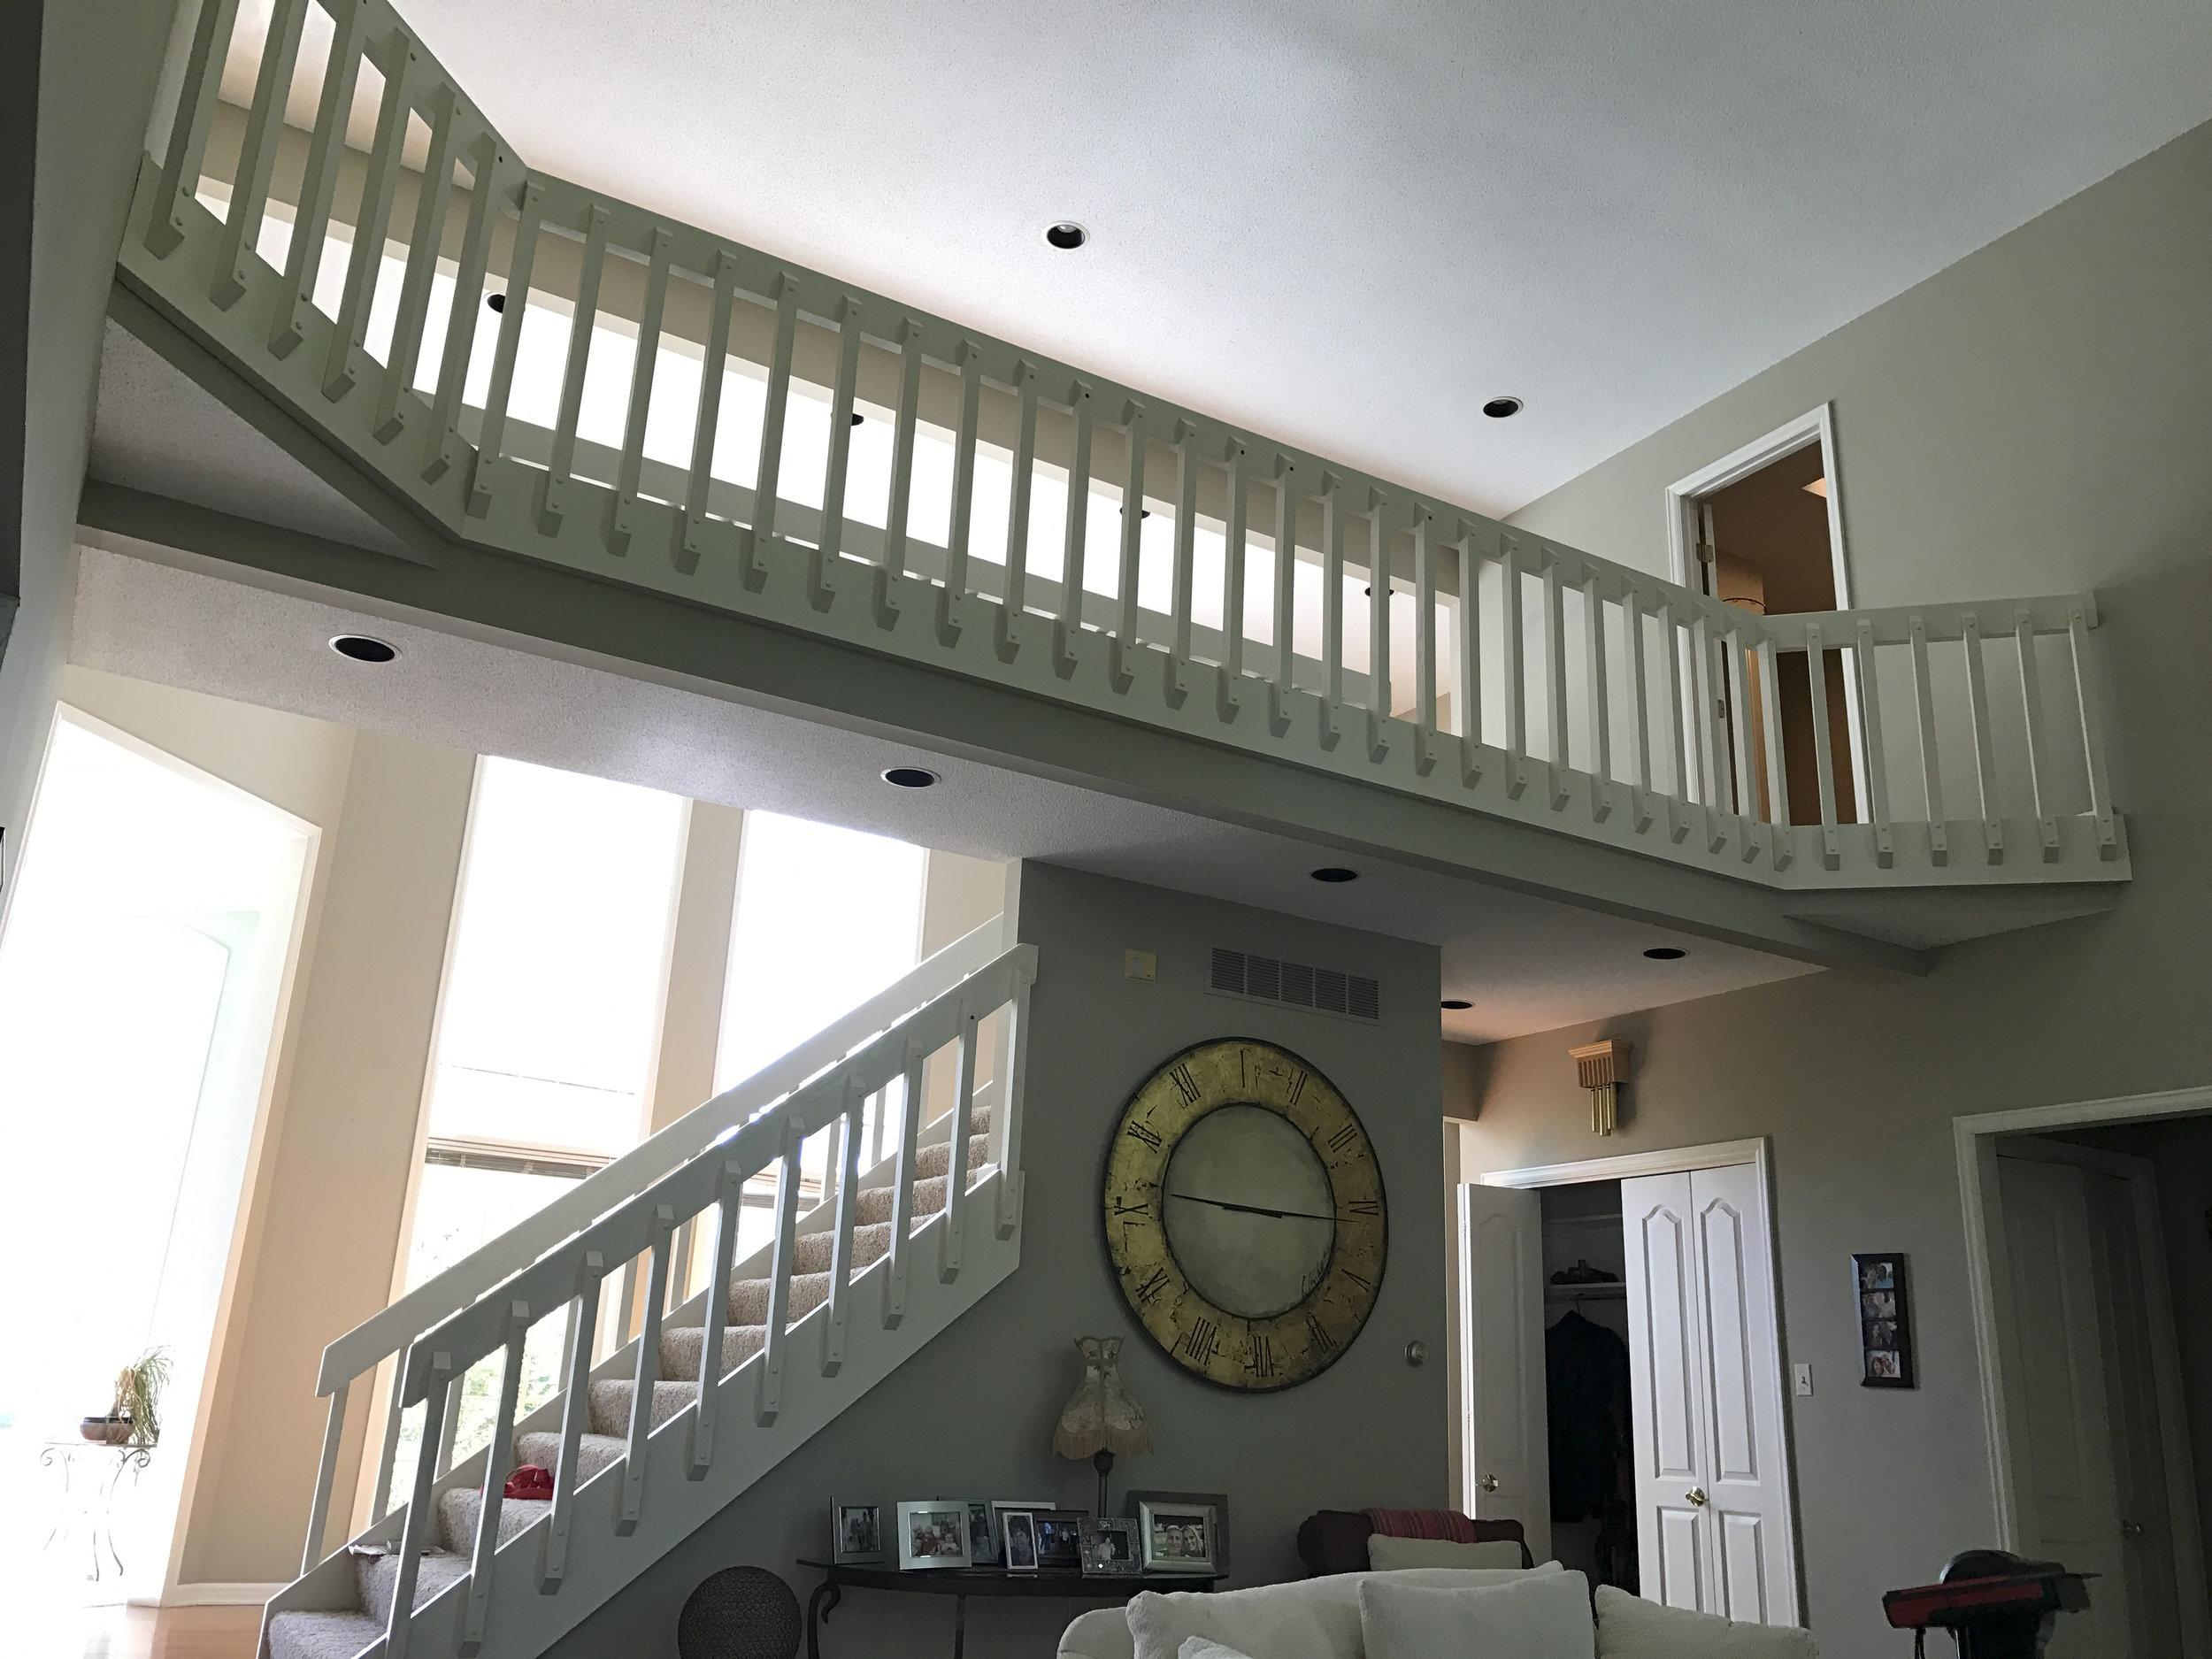 Existing 2nd floor balcony.